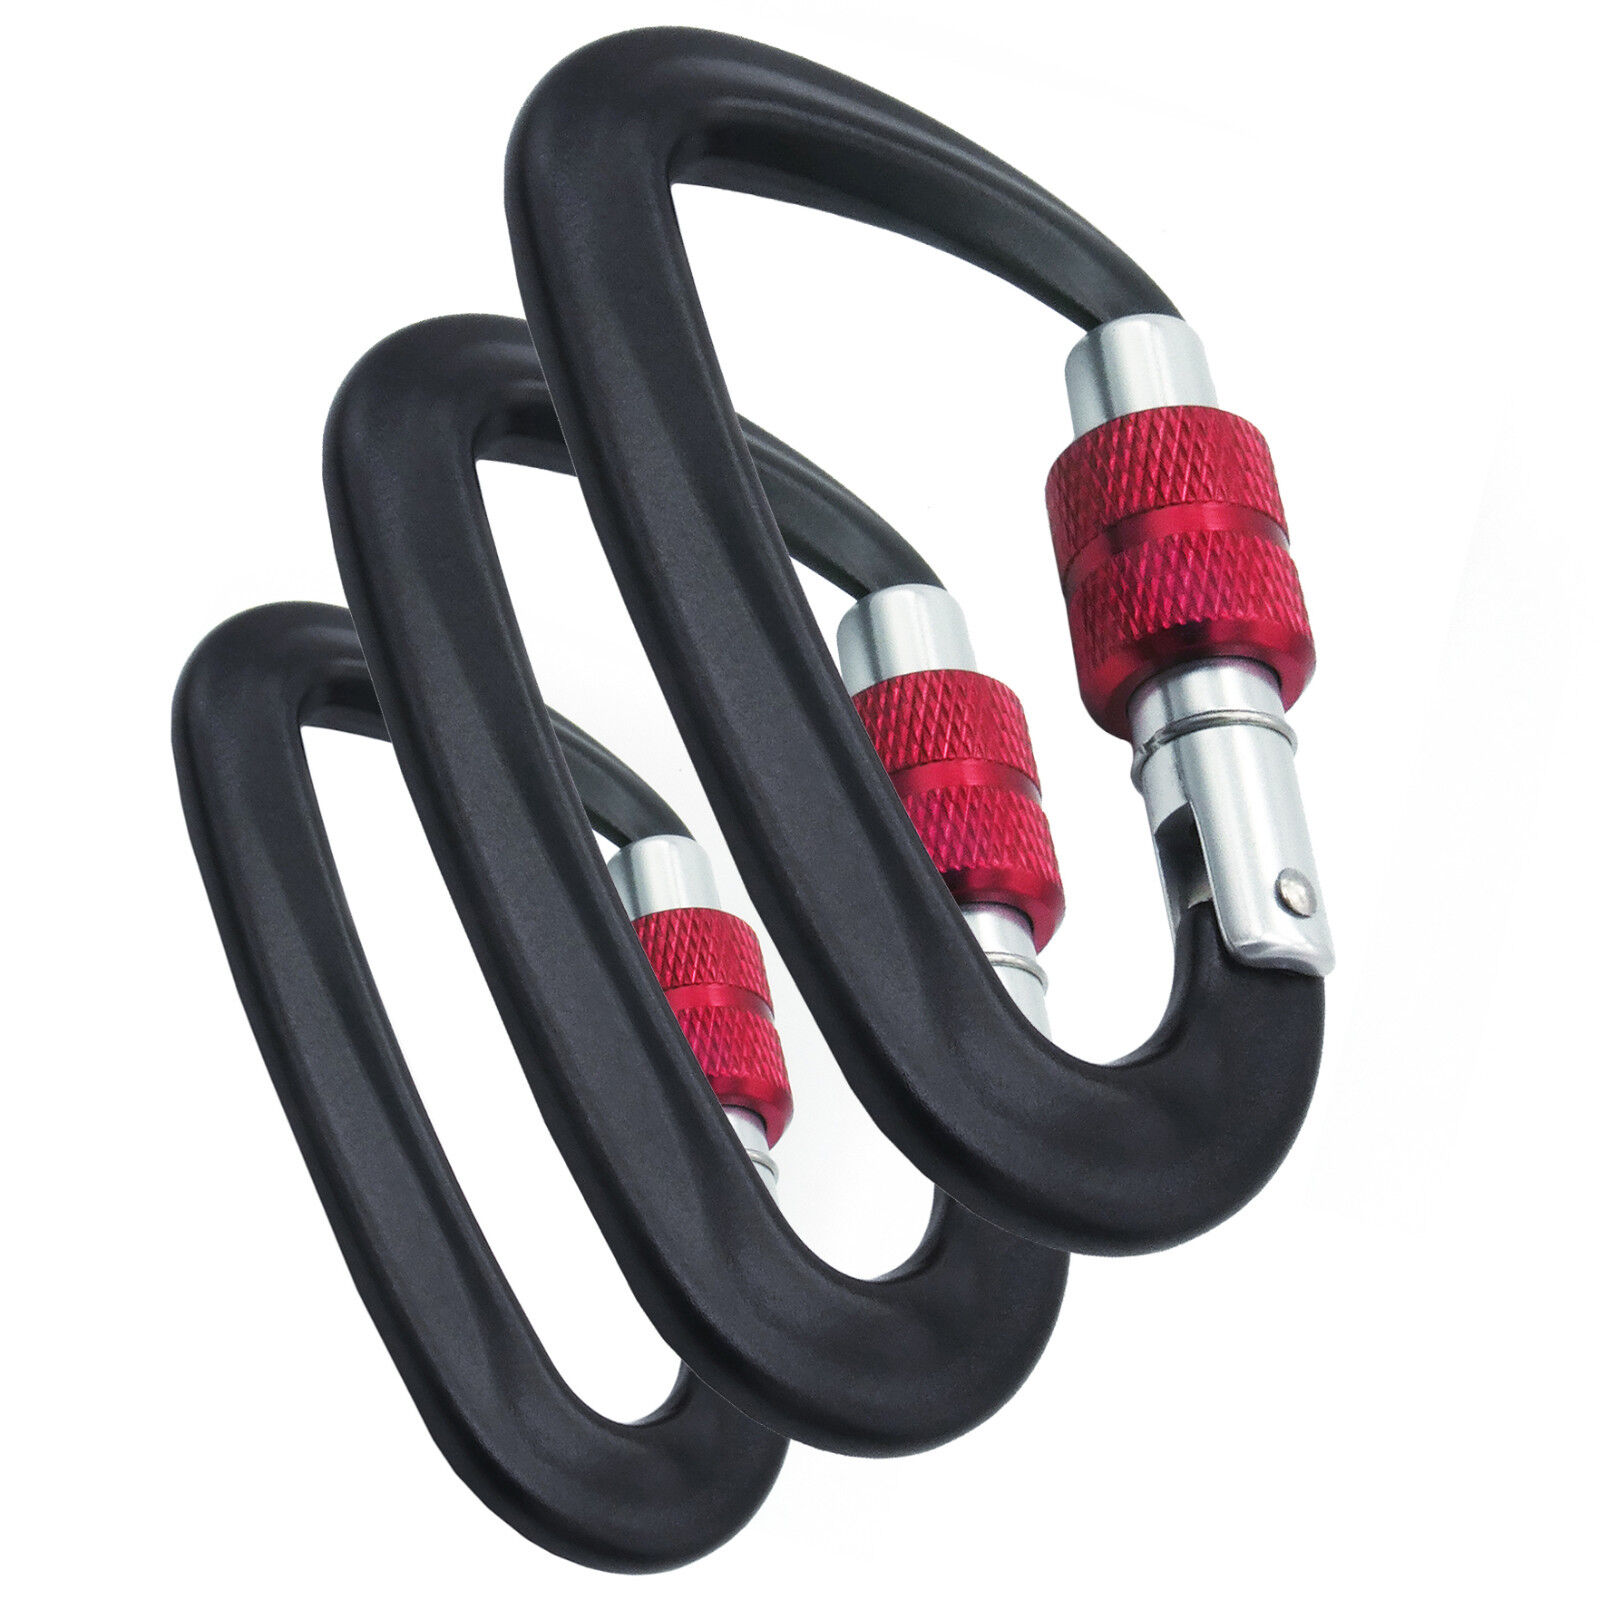 Black / Red Locking Carabiner Aluminum Climbing Hook